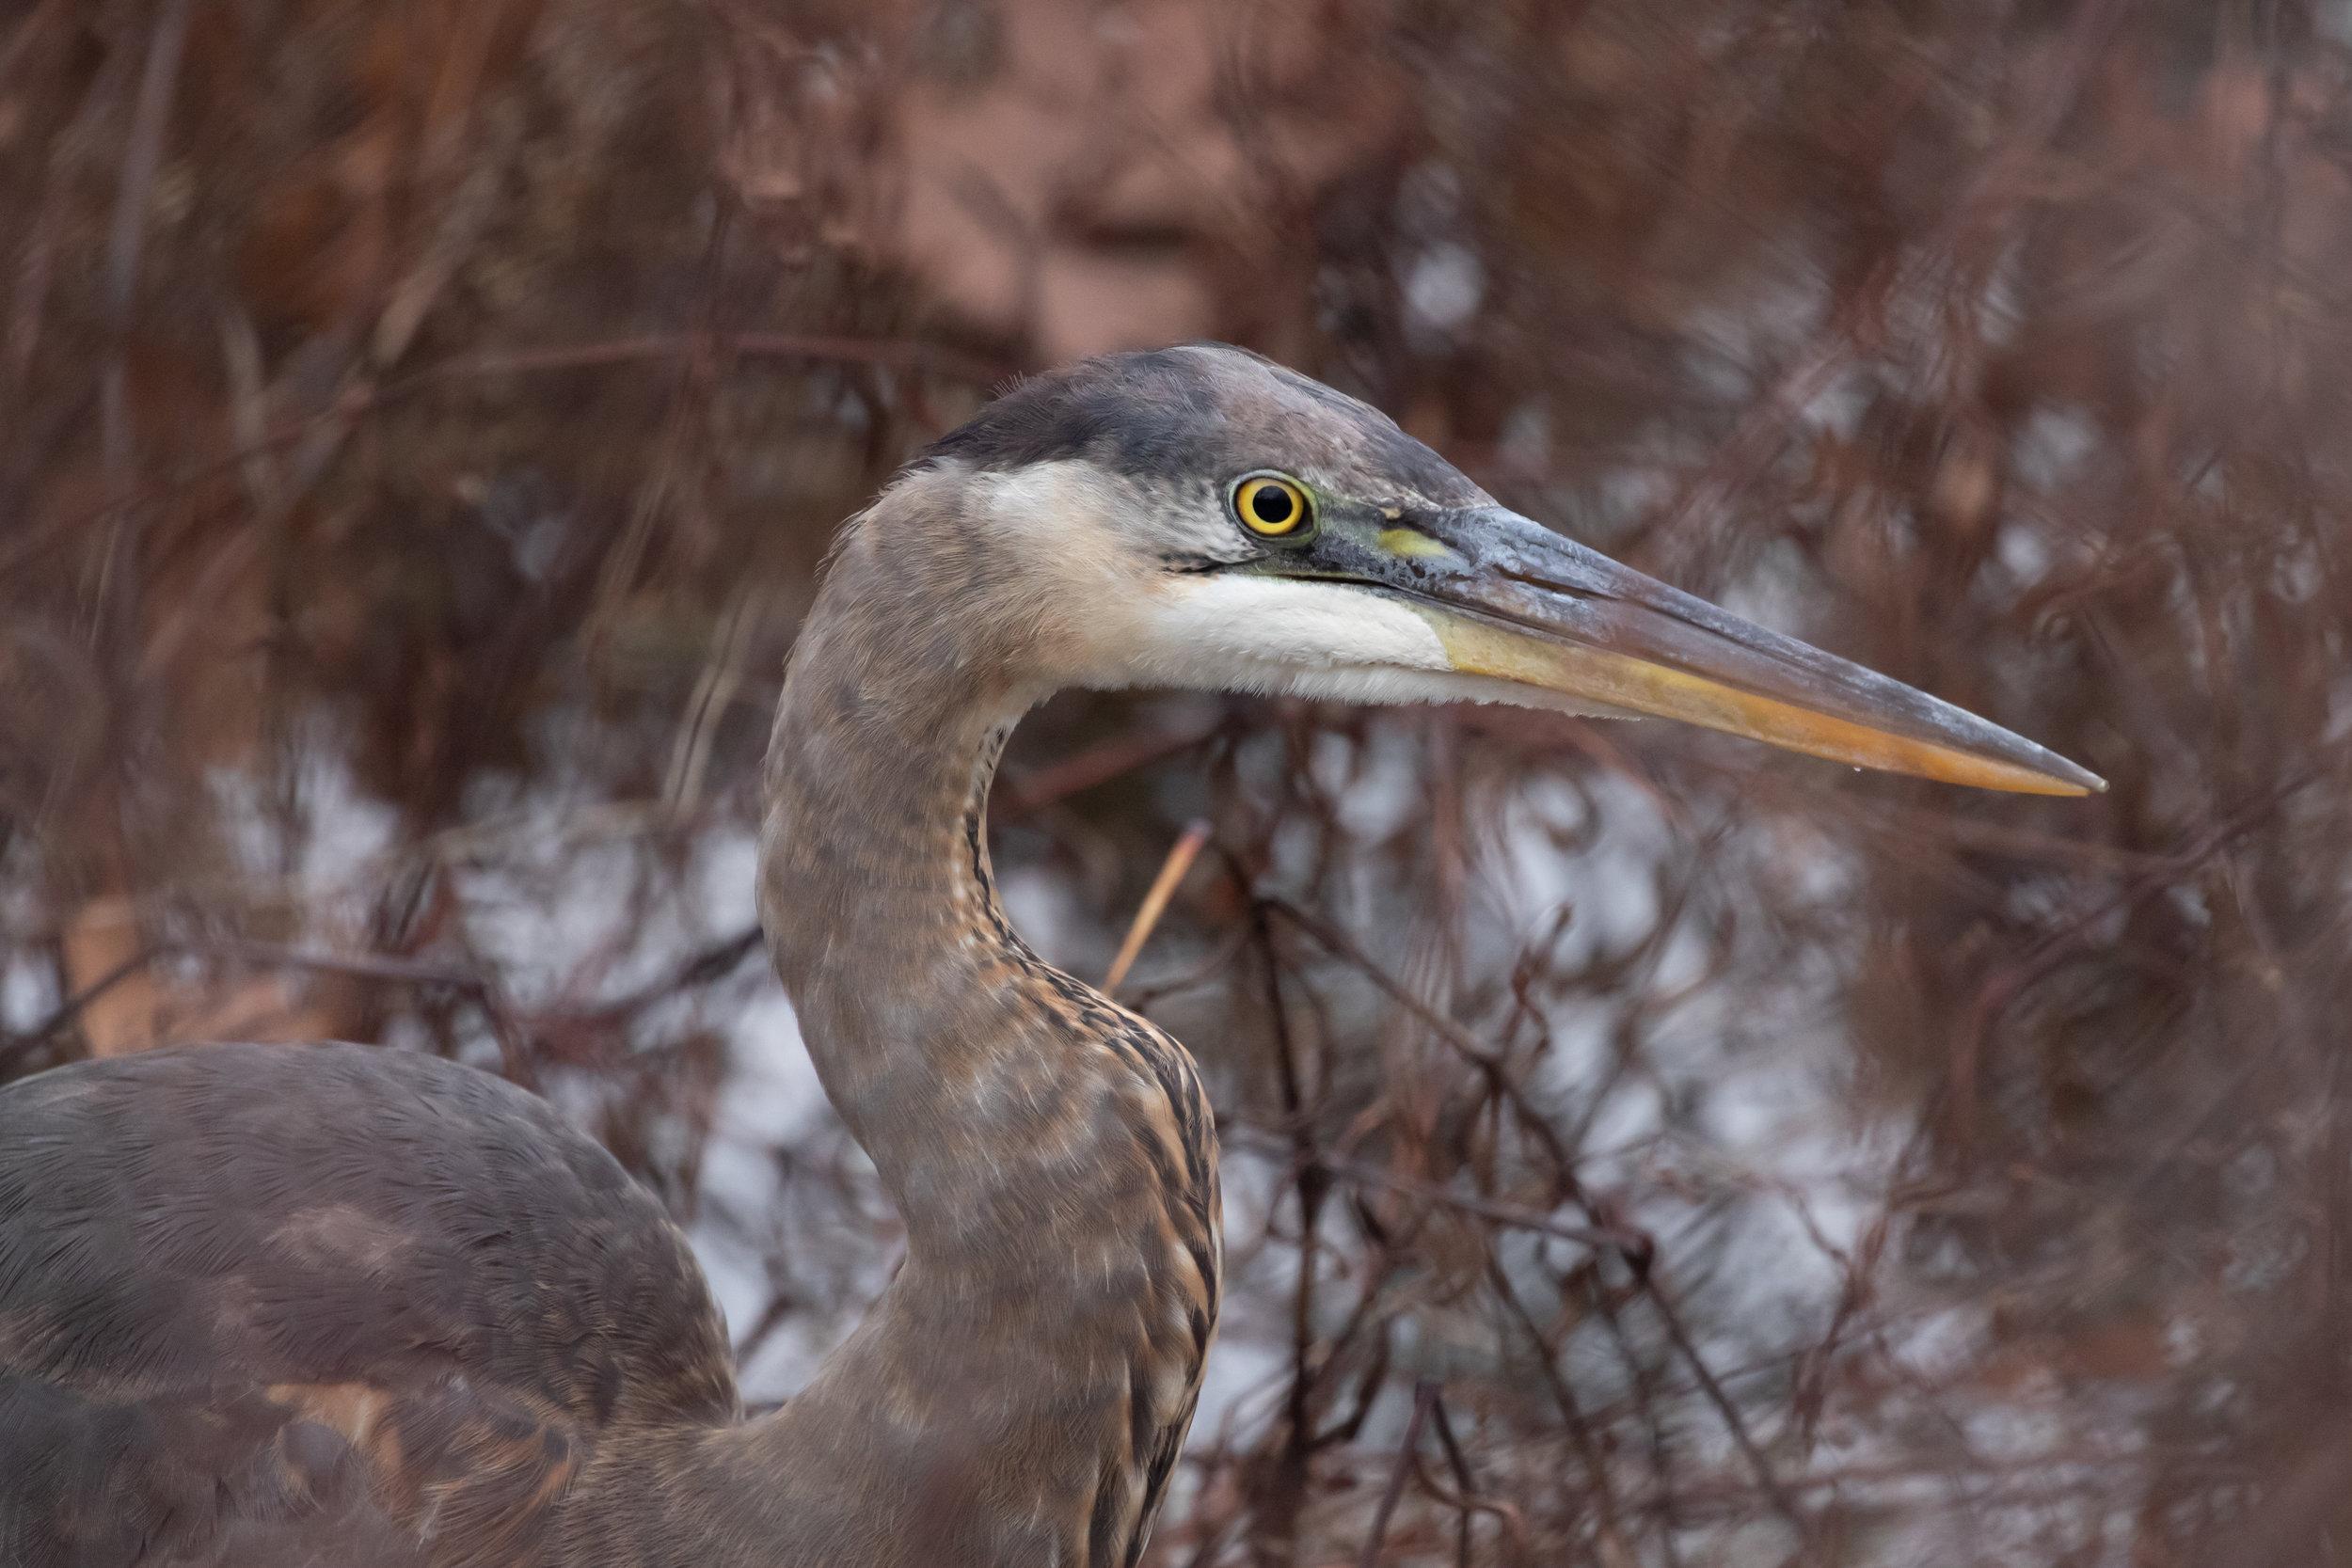 Great Blue Heron, December 15, 2018